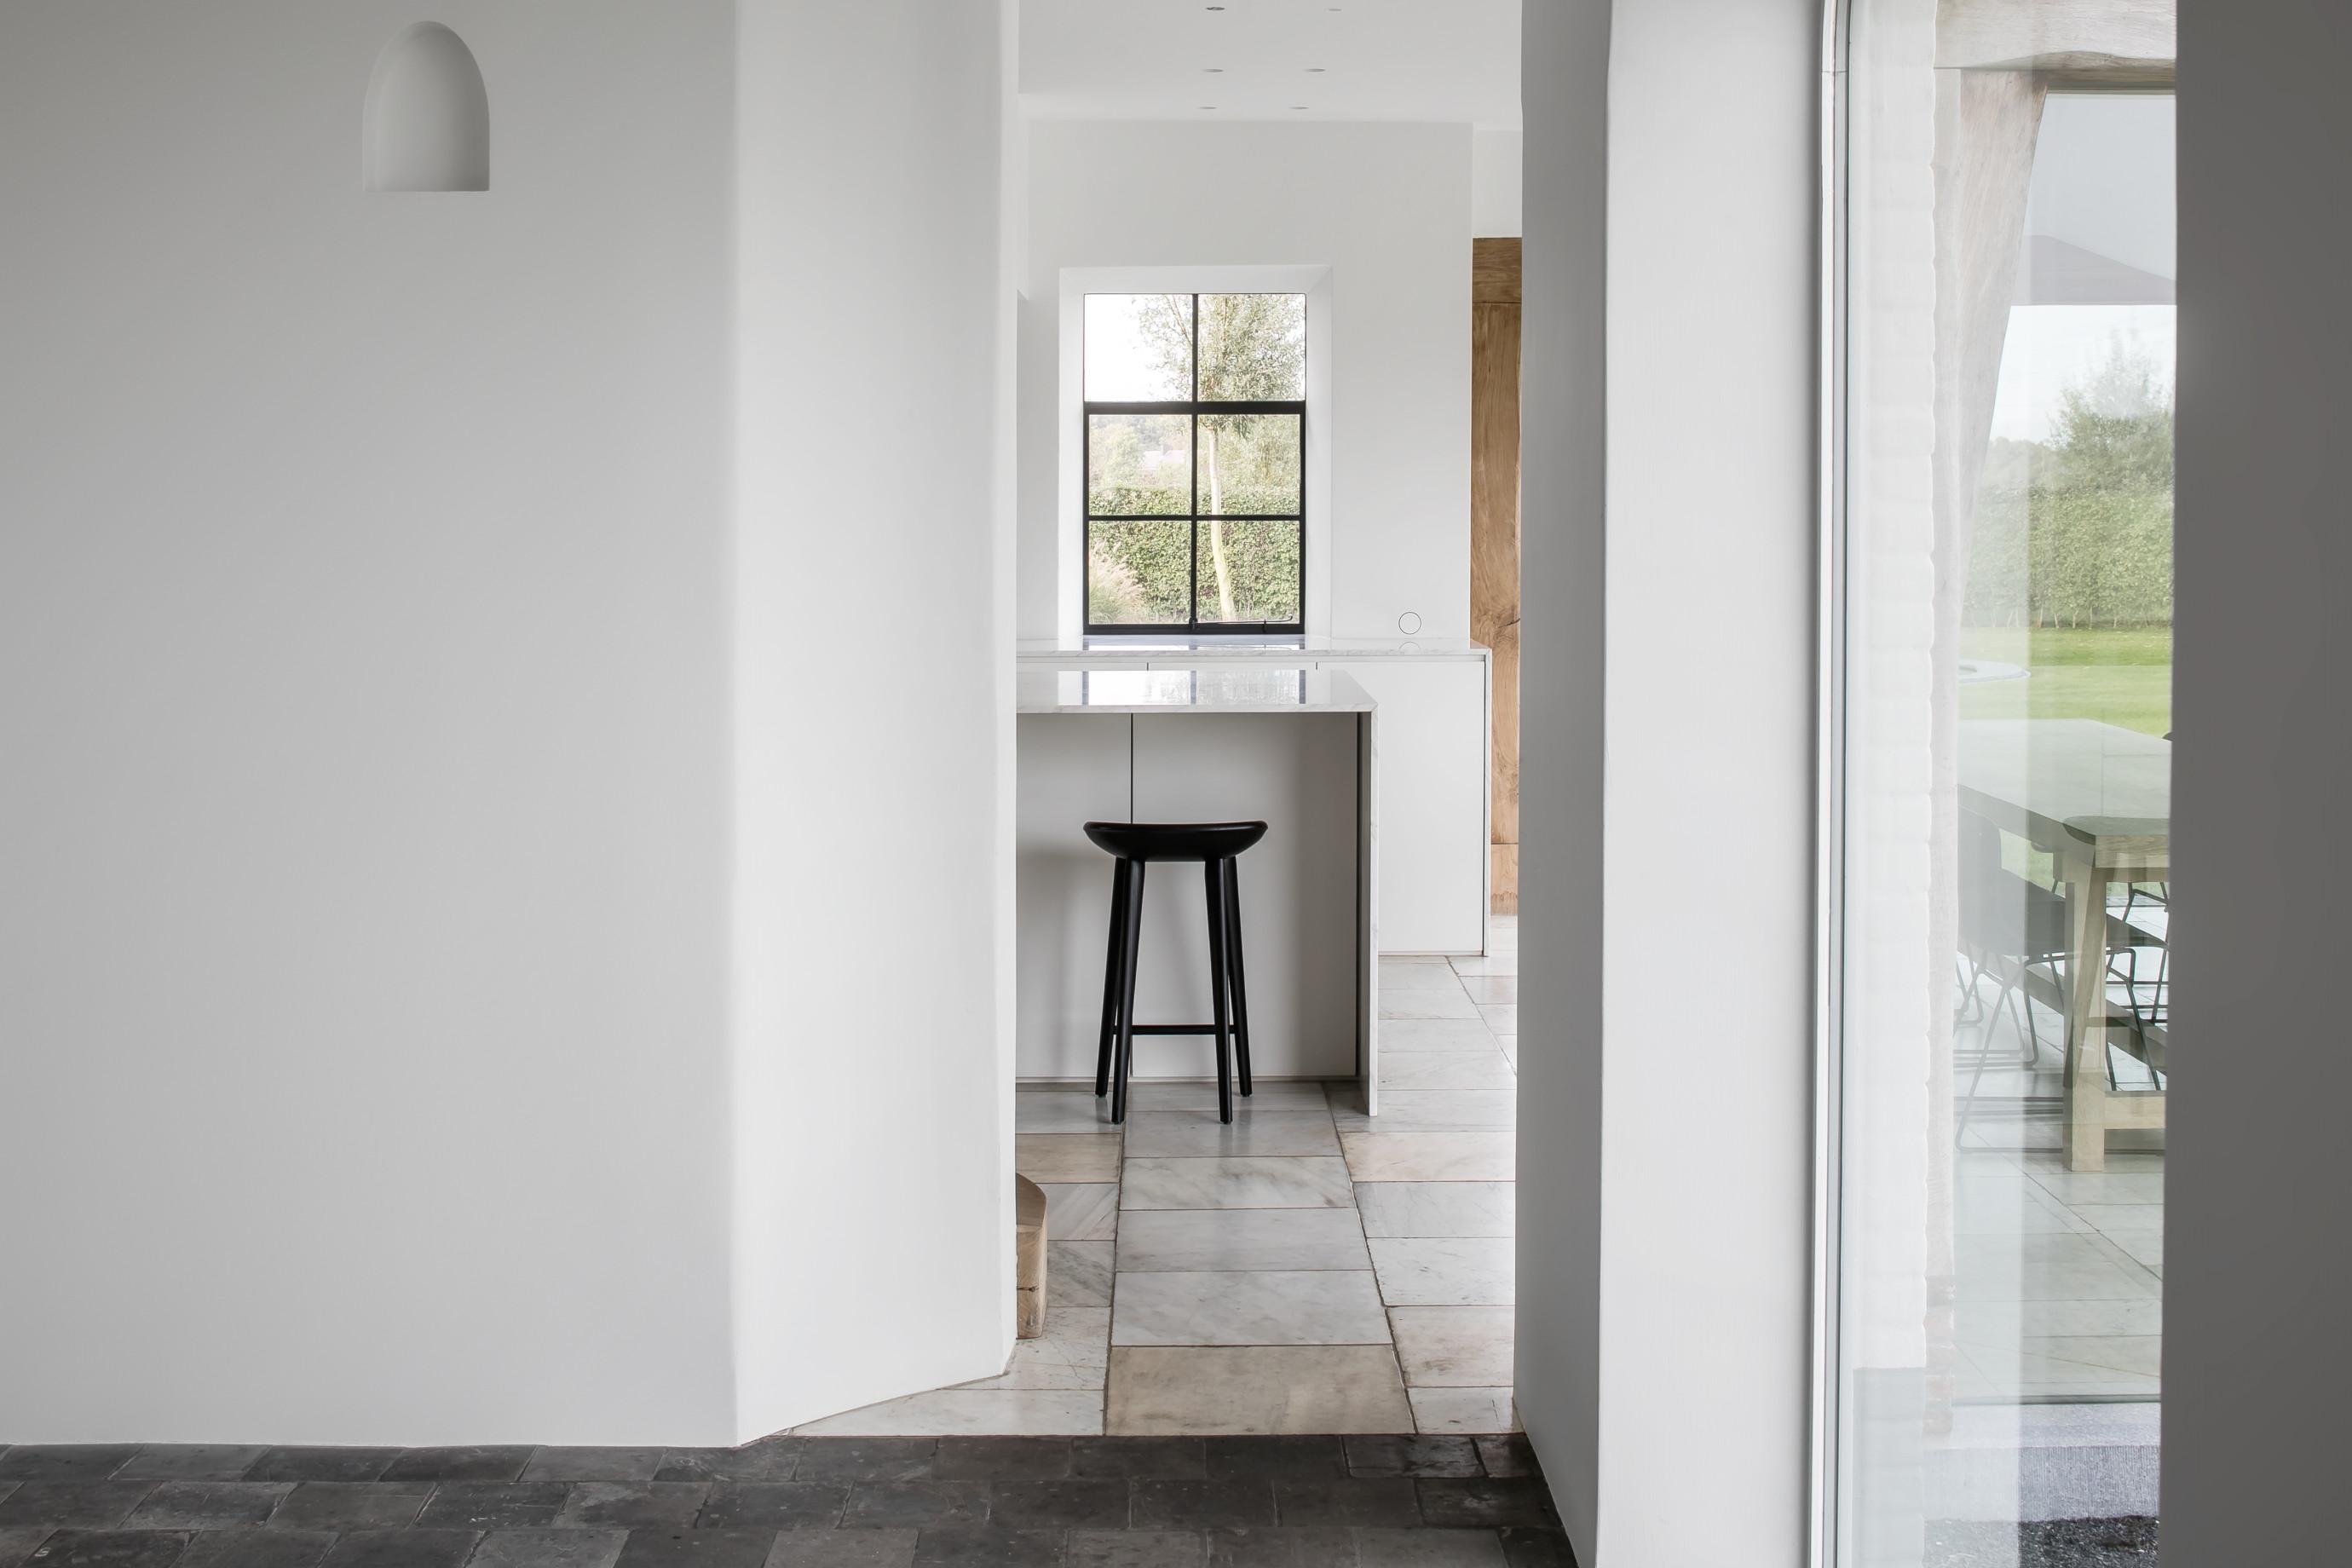 am designs-be Waasmunster-13